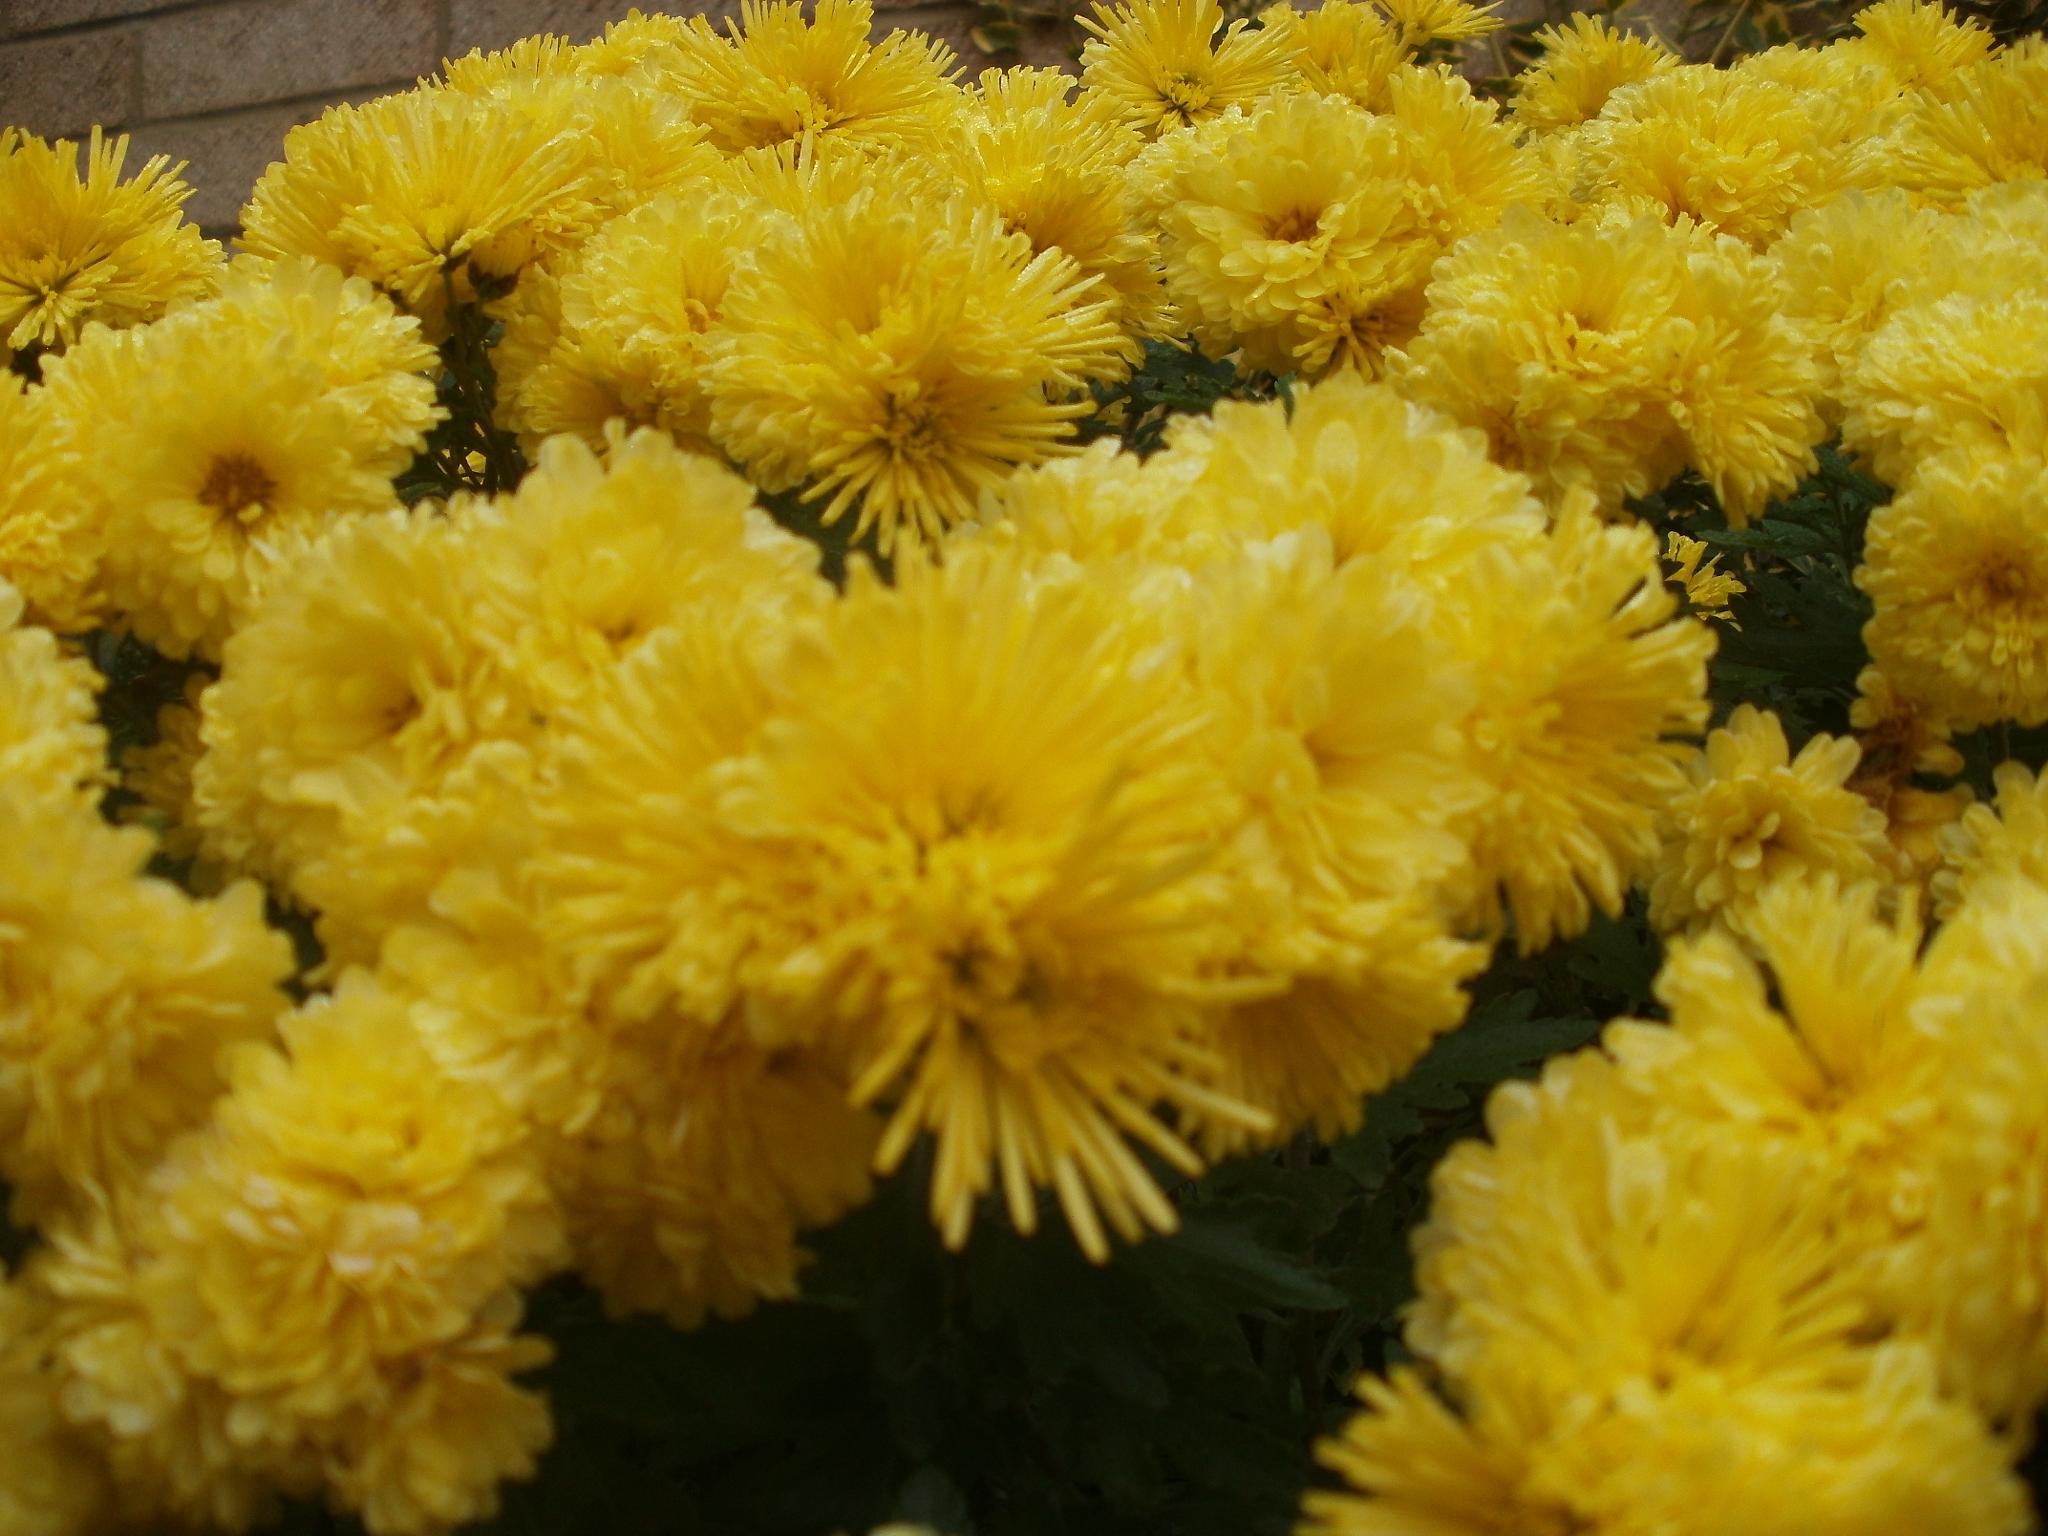 A Bunch of Yellow Flowers by kennaclarke